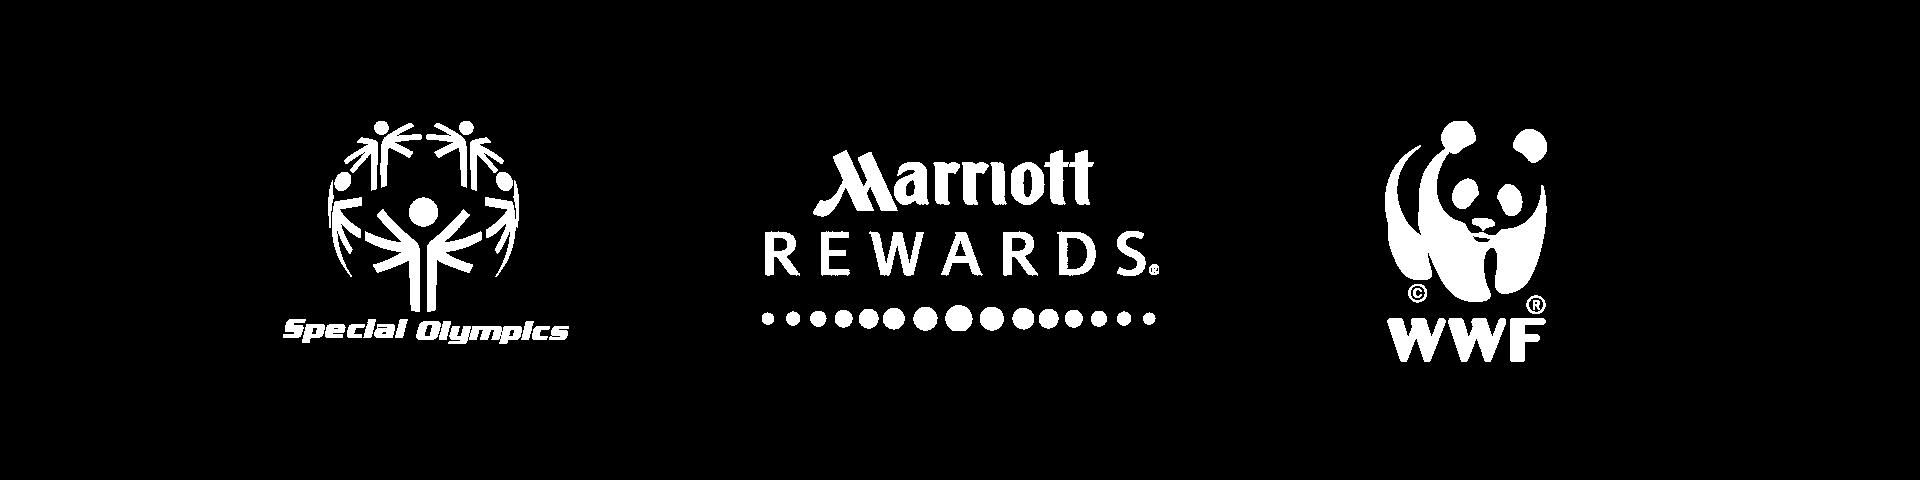 Marriott, Special Olympics, WWF